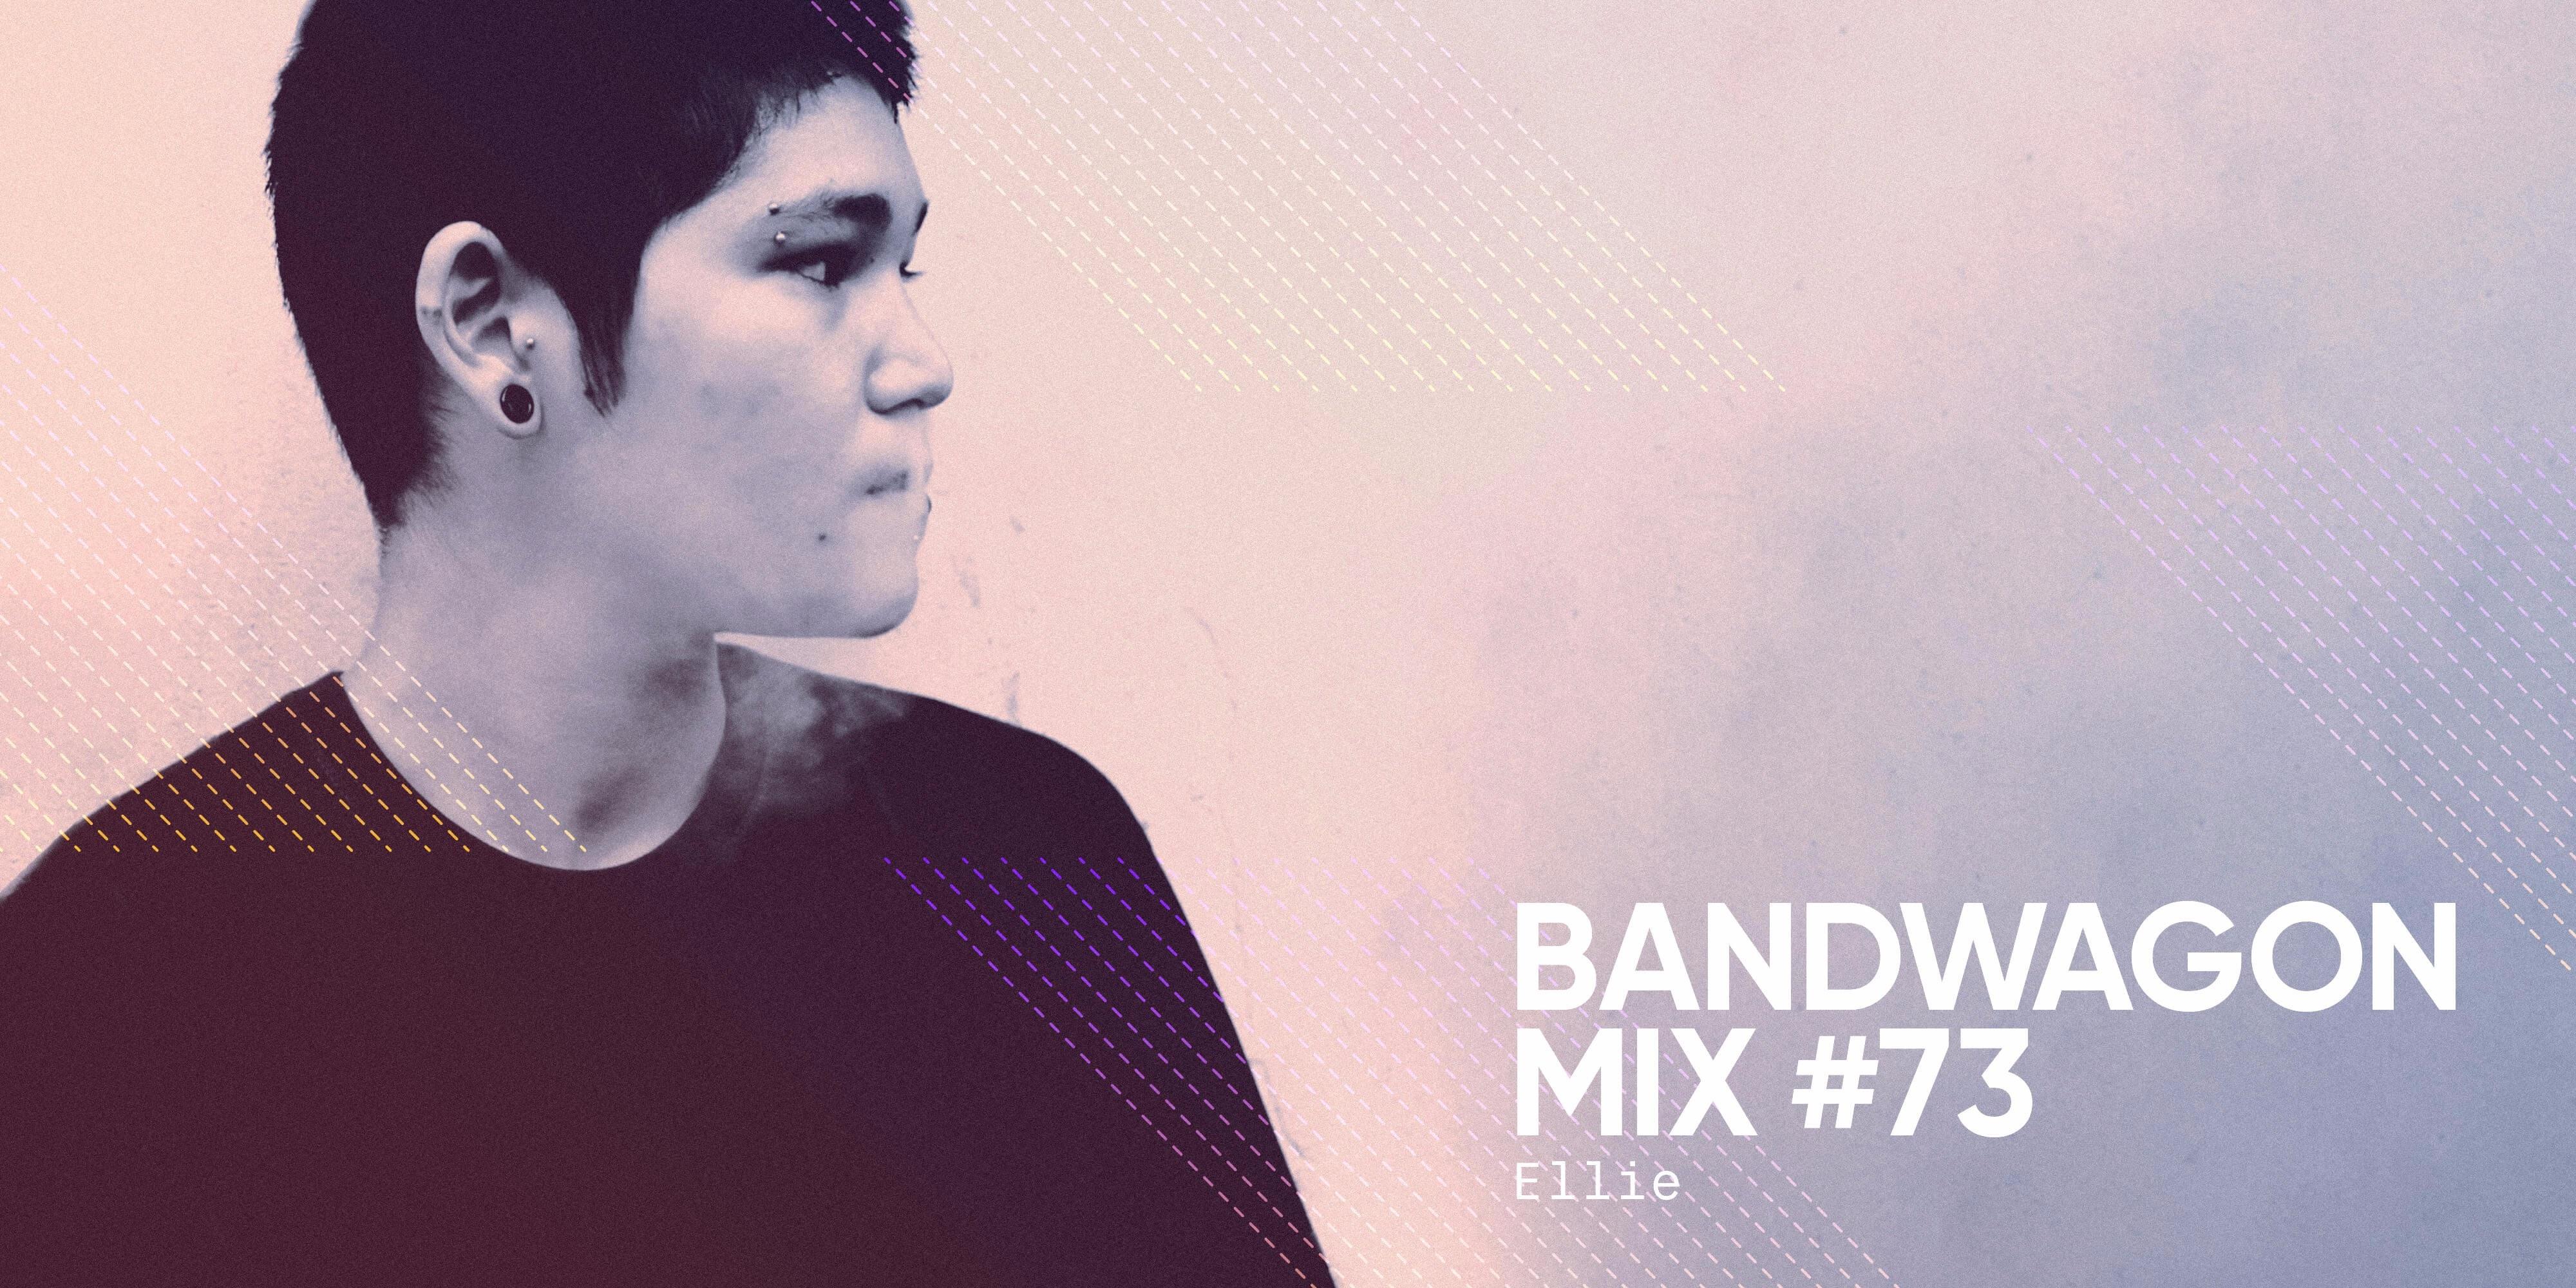 Bandwagon Mix #73: Ellie